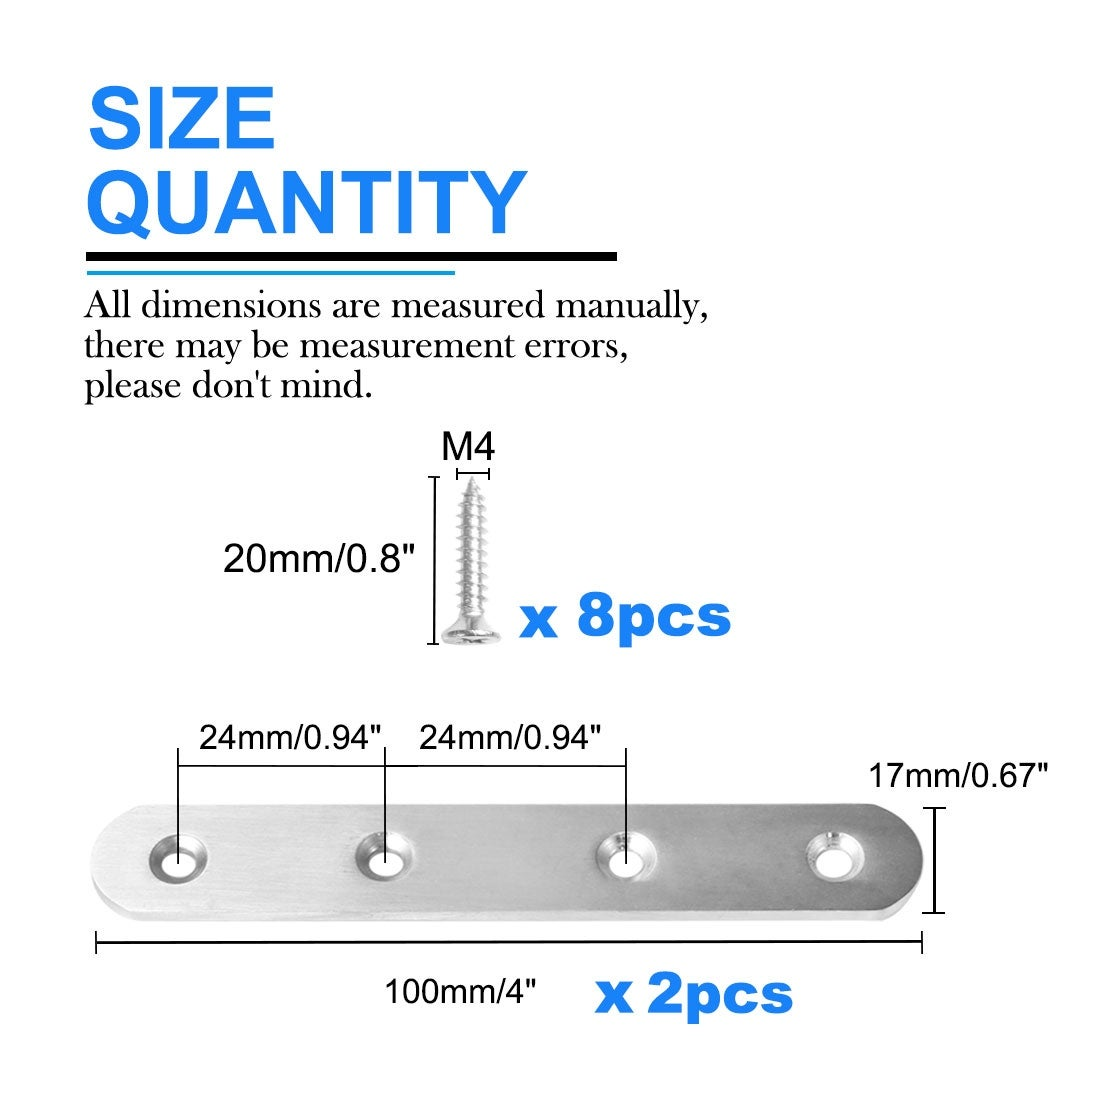 24 piece Corner Bracket plastic brown 24mm x 24mm x 17mm Braces